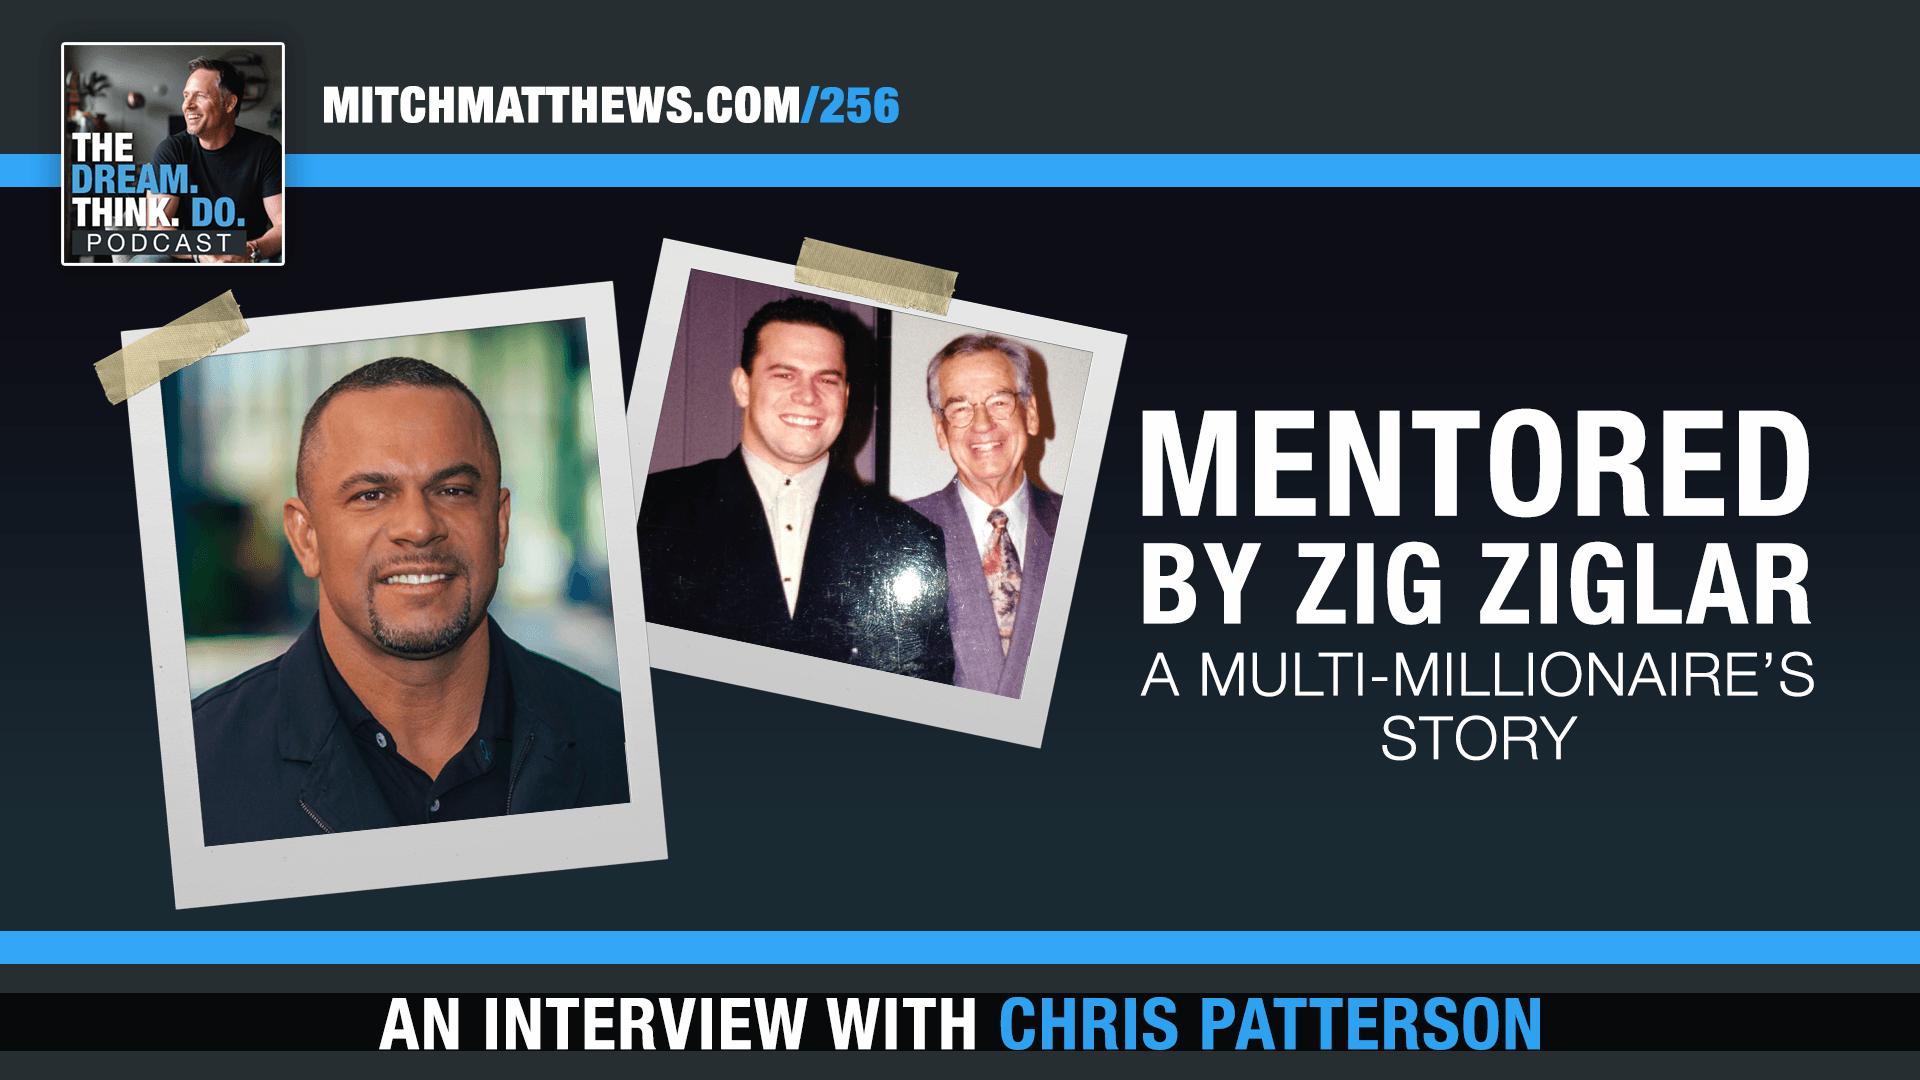 Chris Patterson Interview with Mitch Matthews